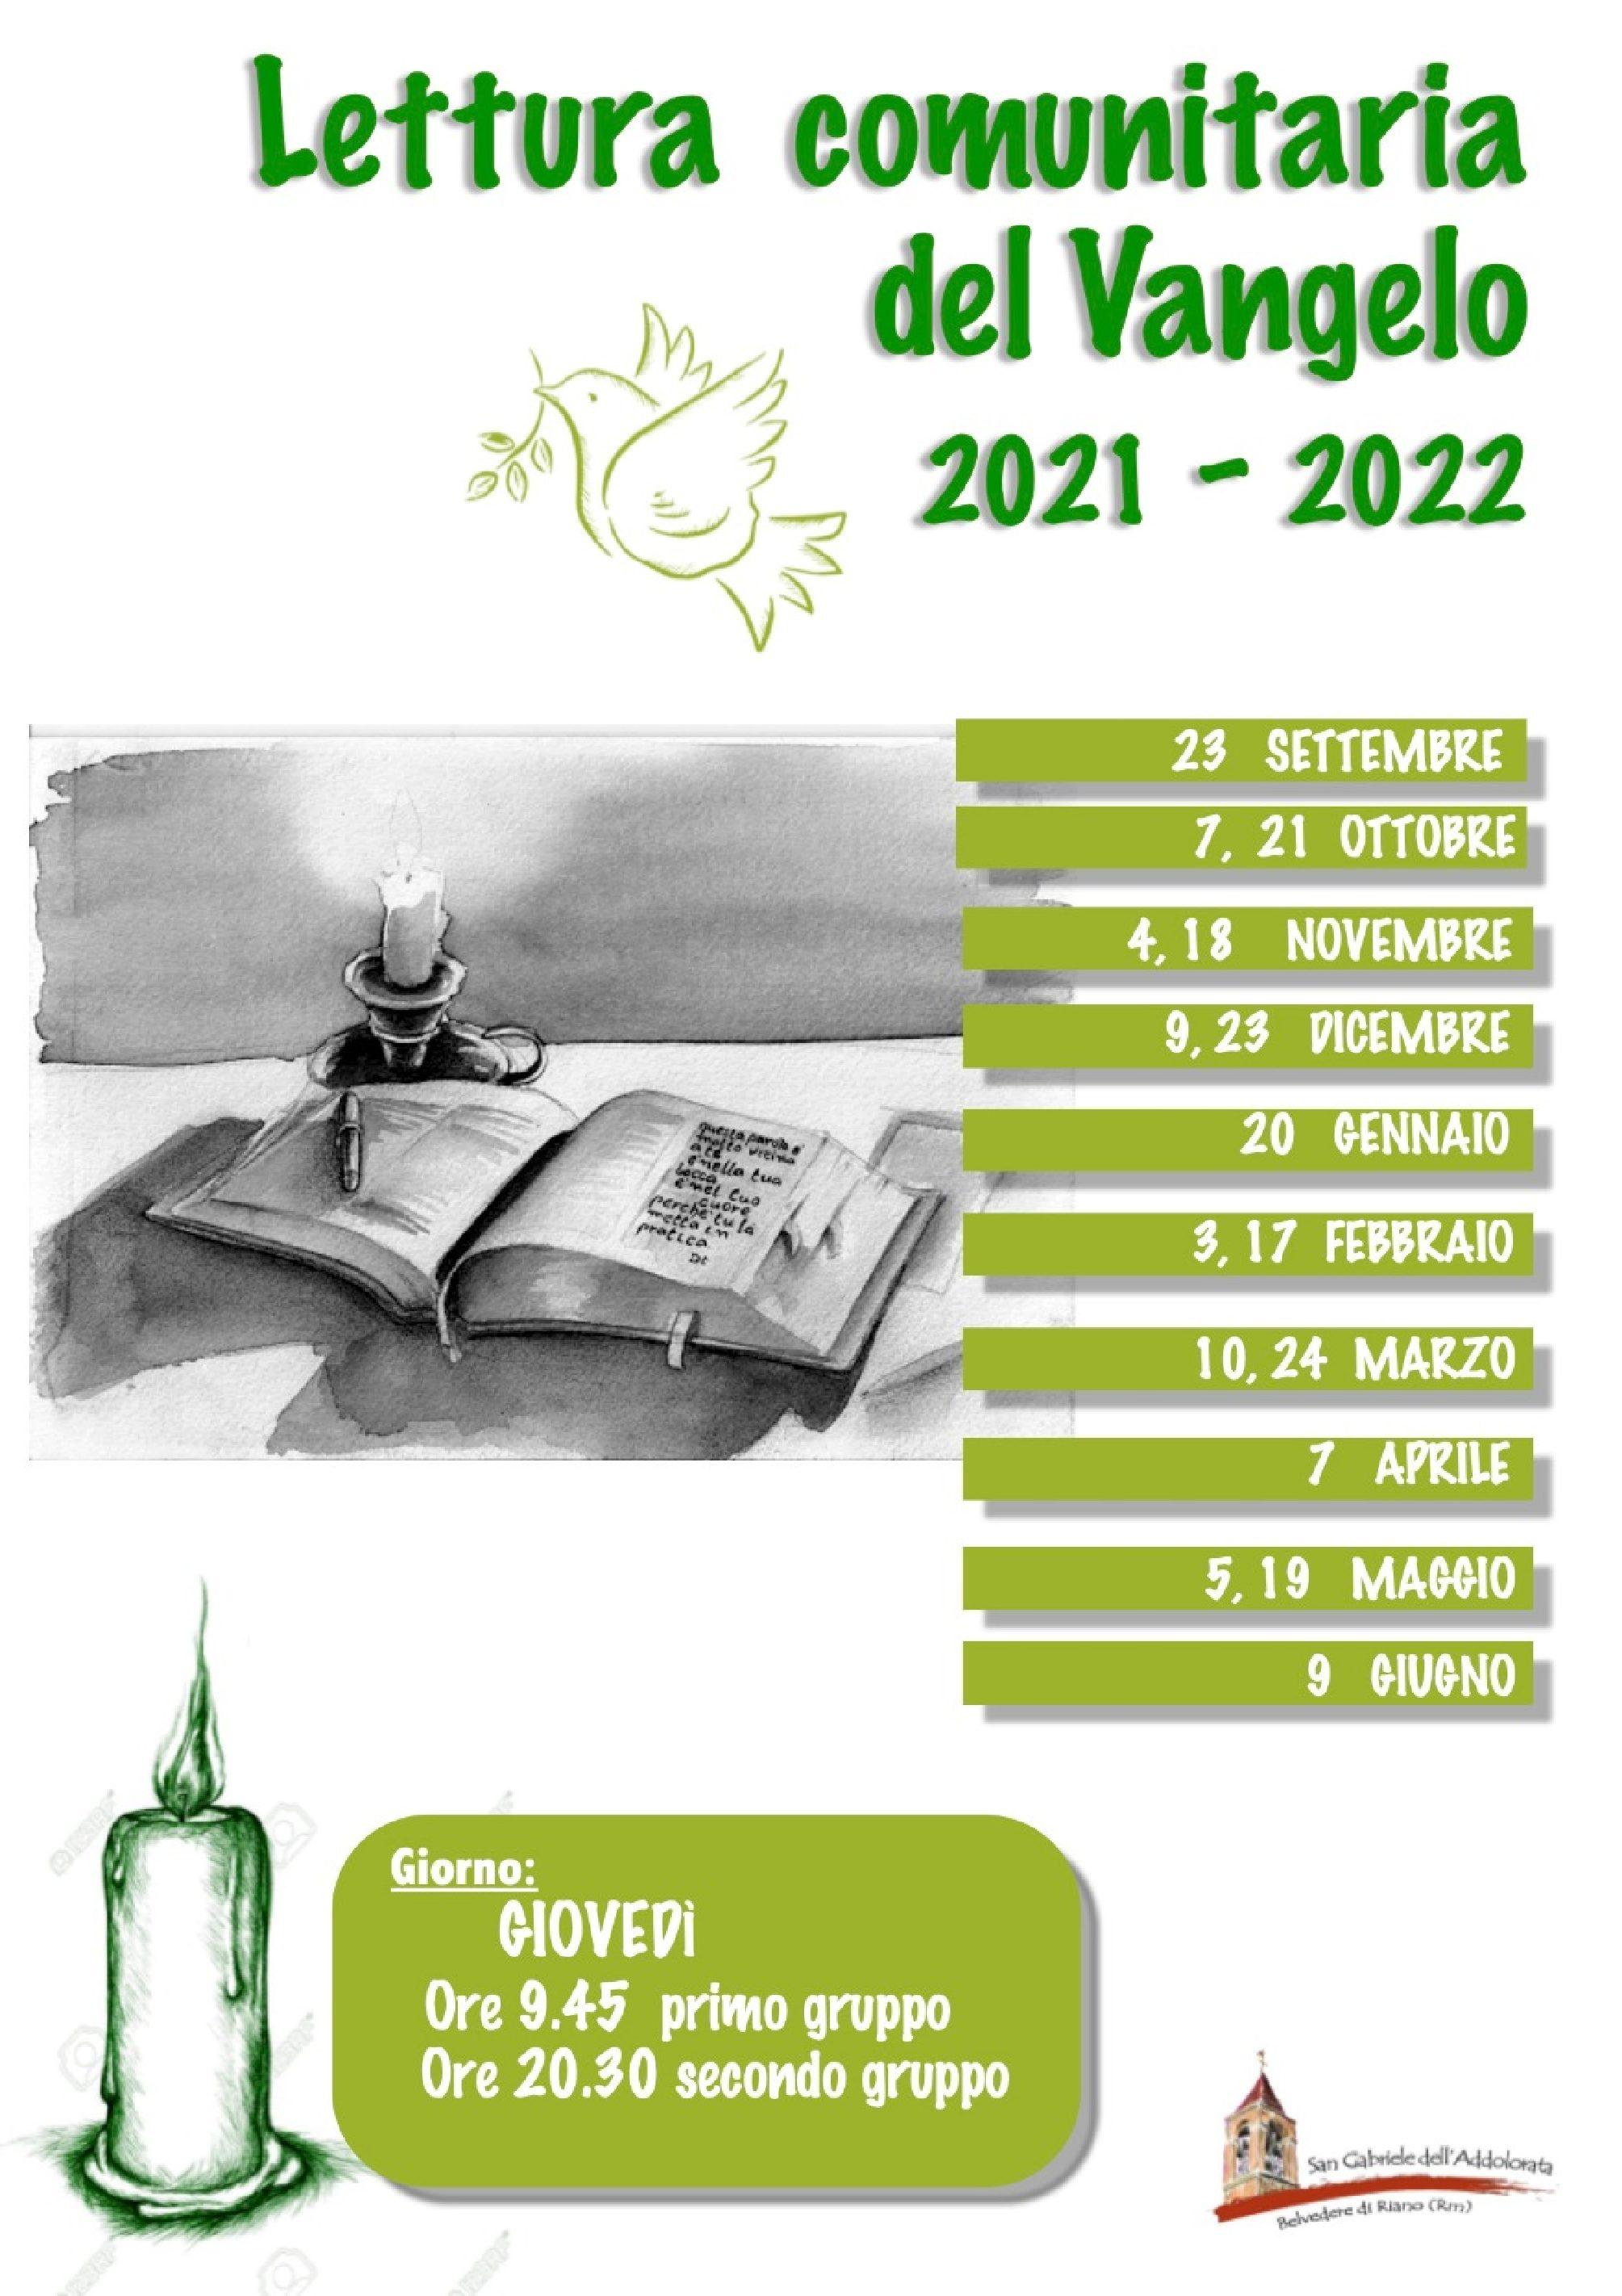 Lettura comunitaria del Vangelo: programma 2021 – 2022